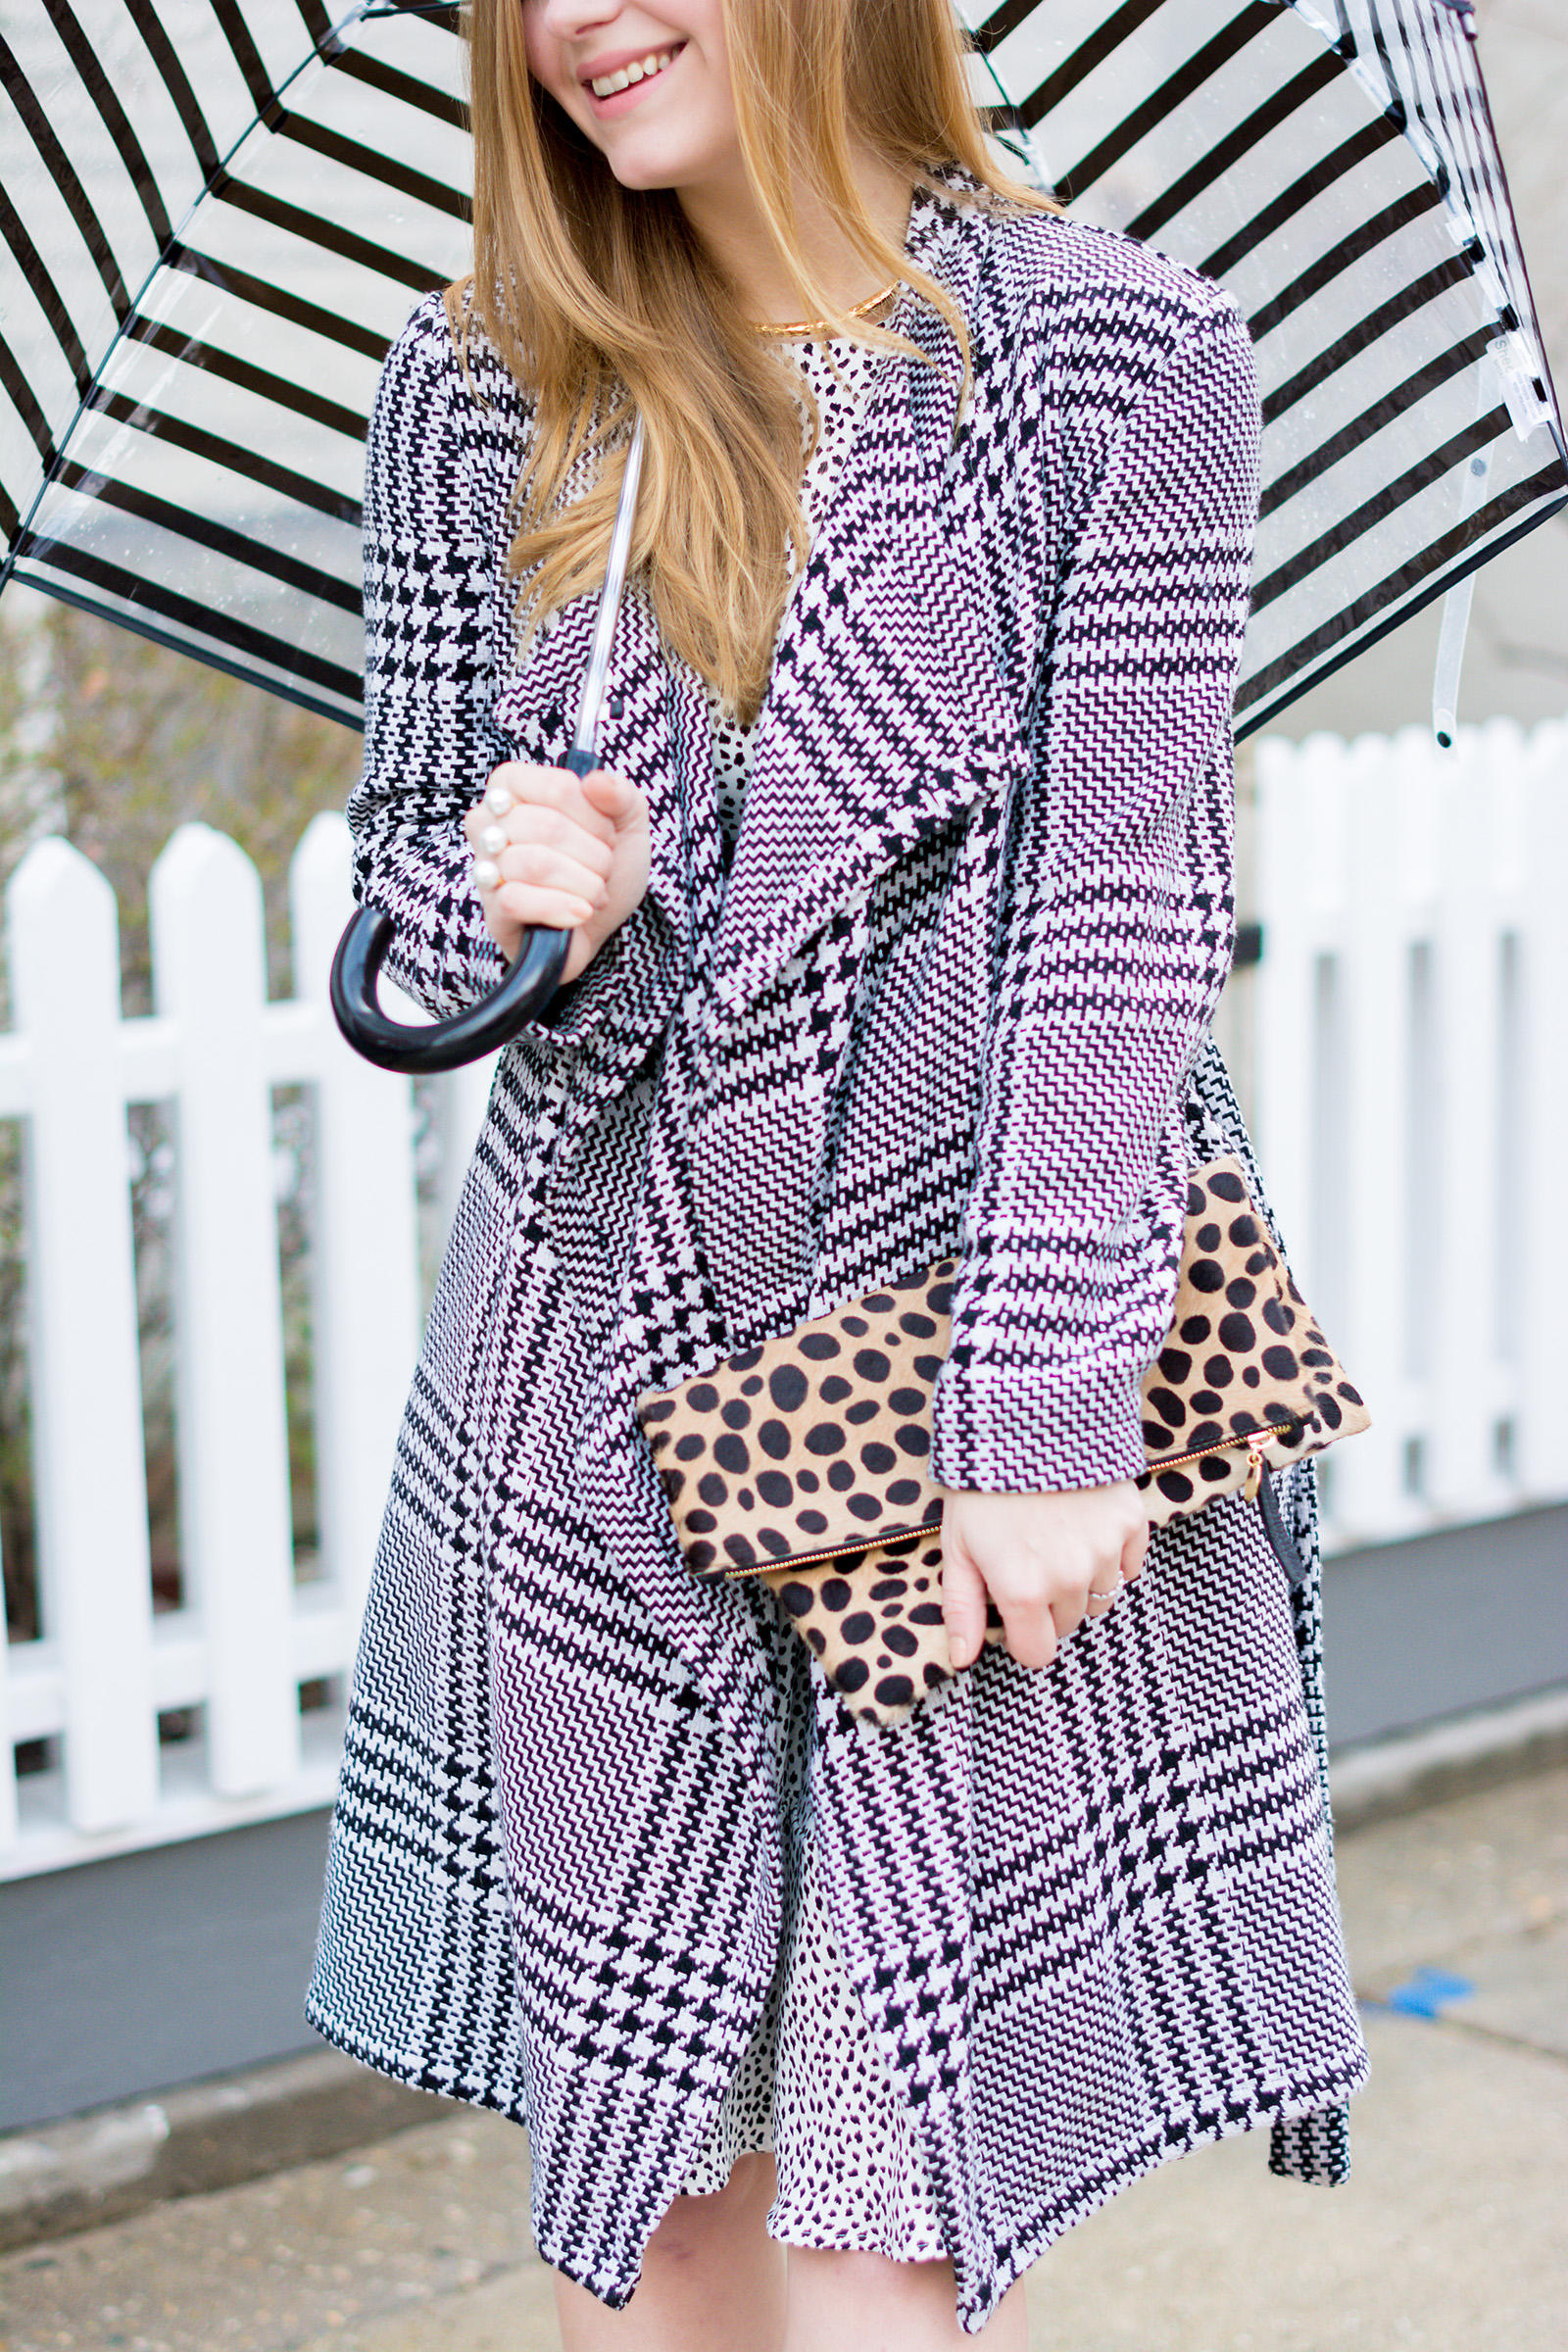 April Showers Outfit Stripes-43202